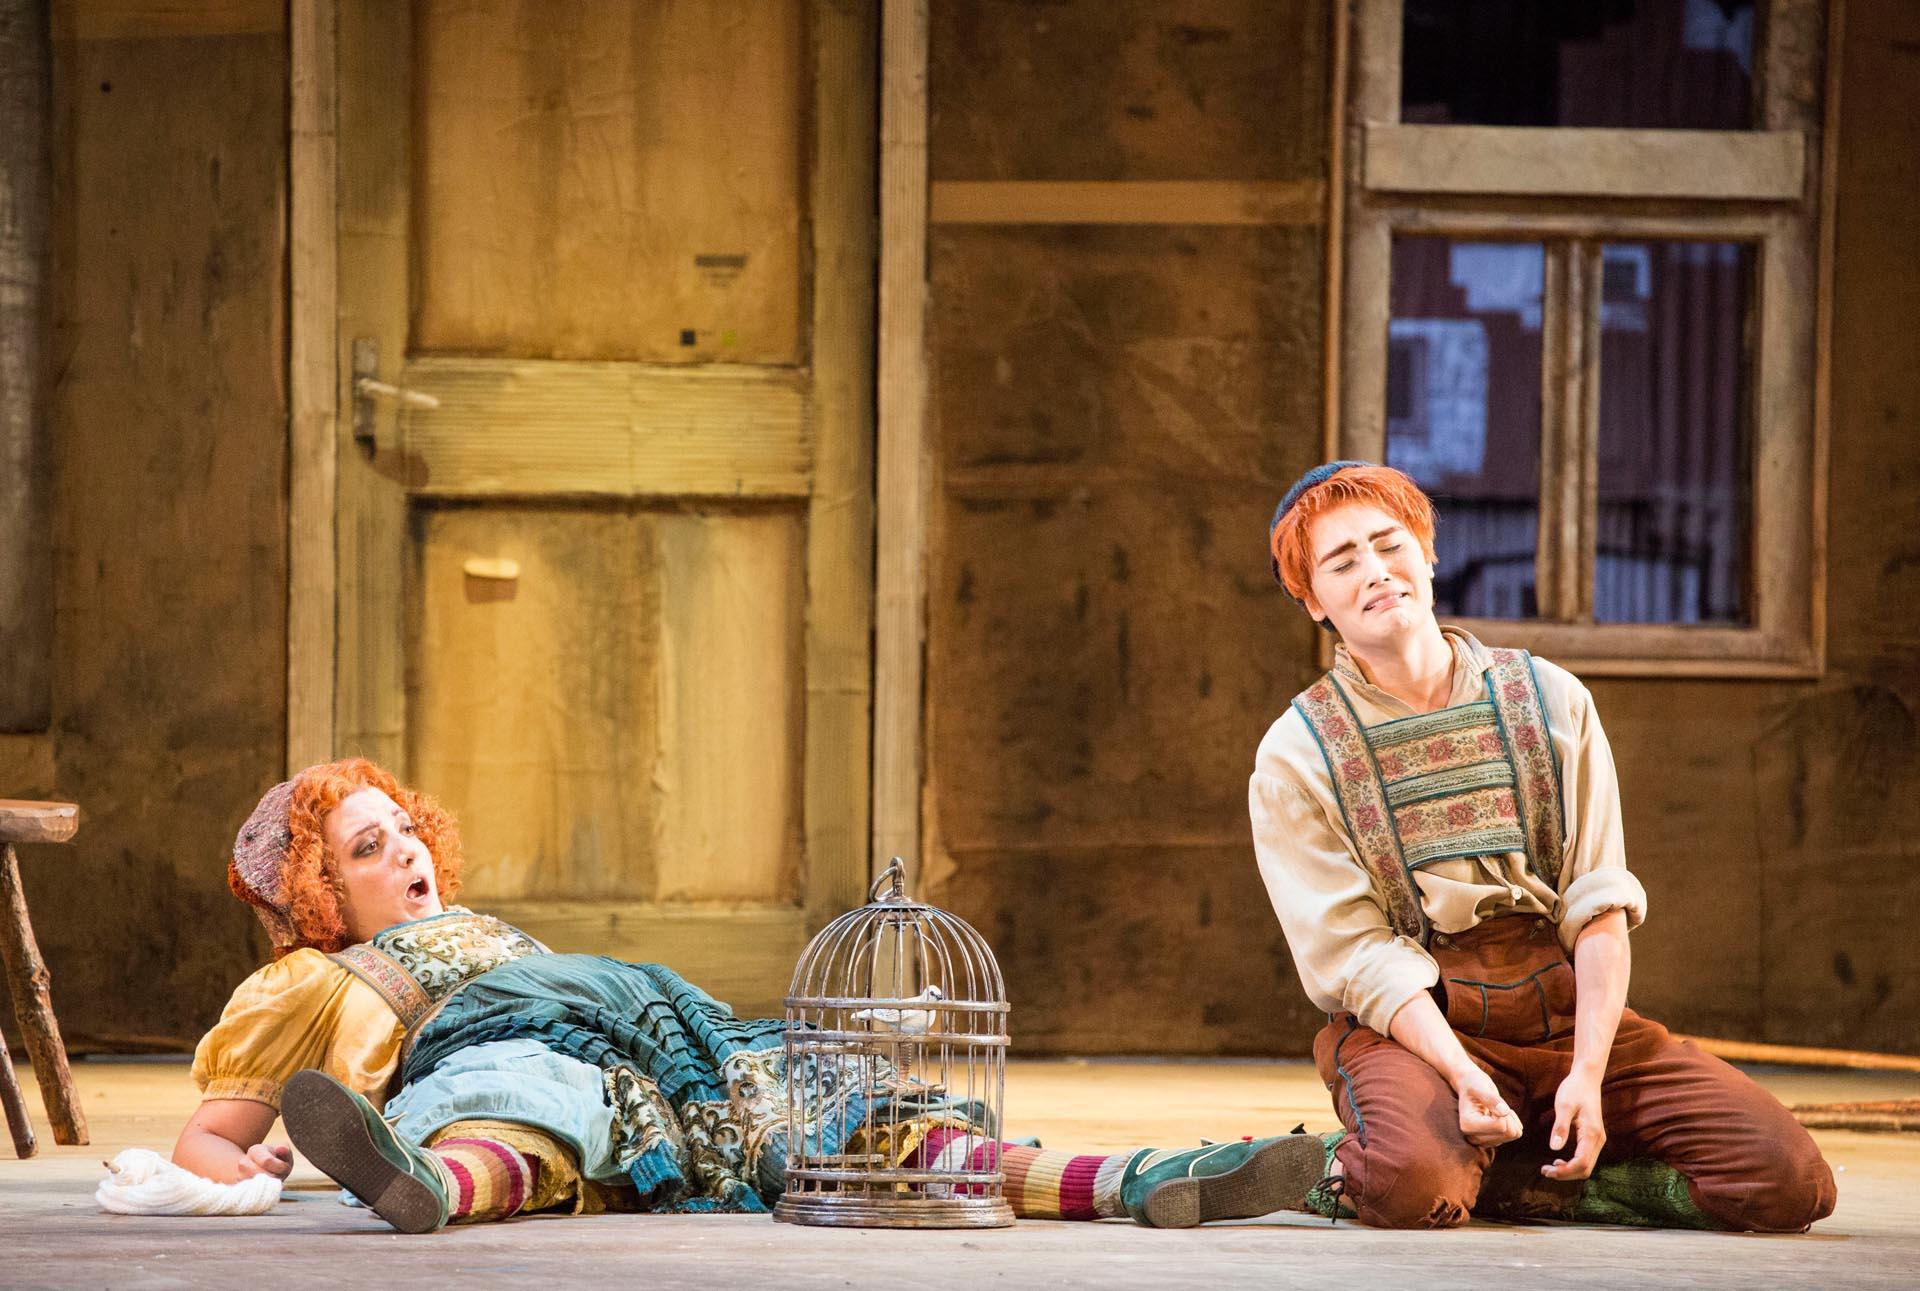 05 Hänsel und Gretel, Teatro alla Scala, 2017, © Brescia und Amisano